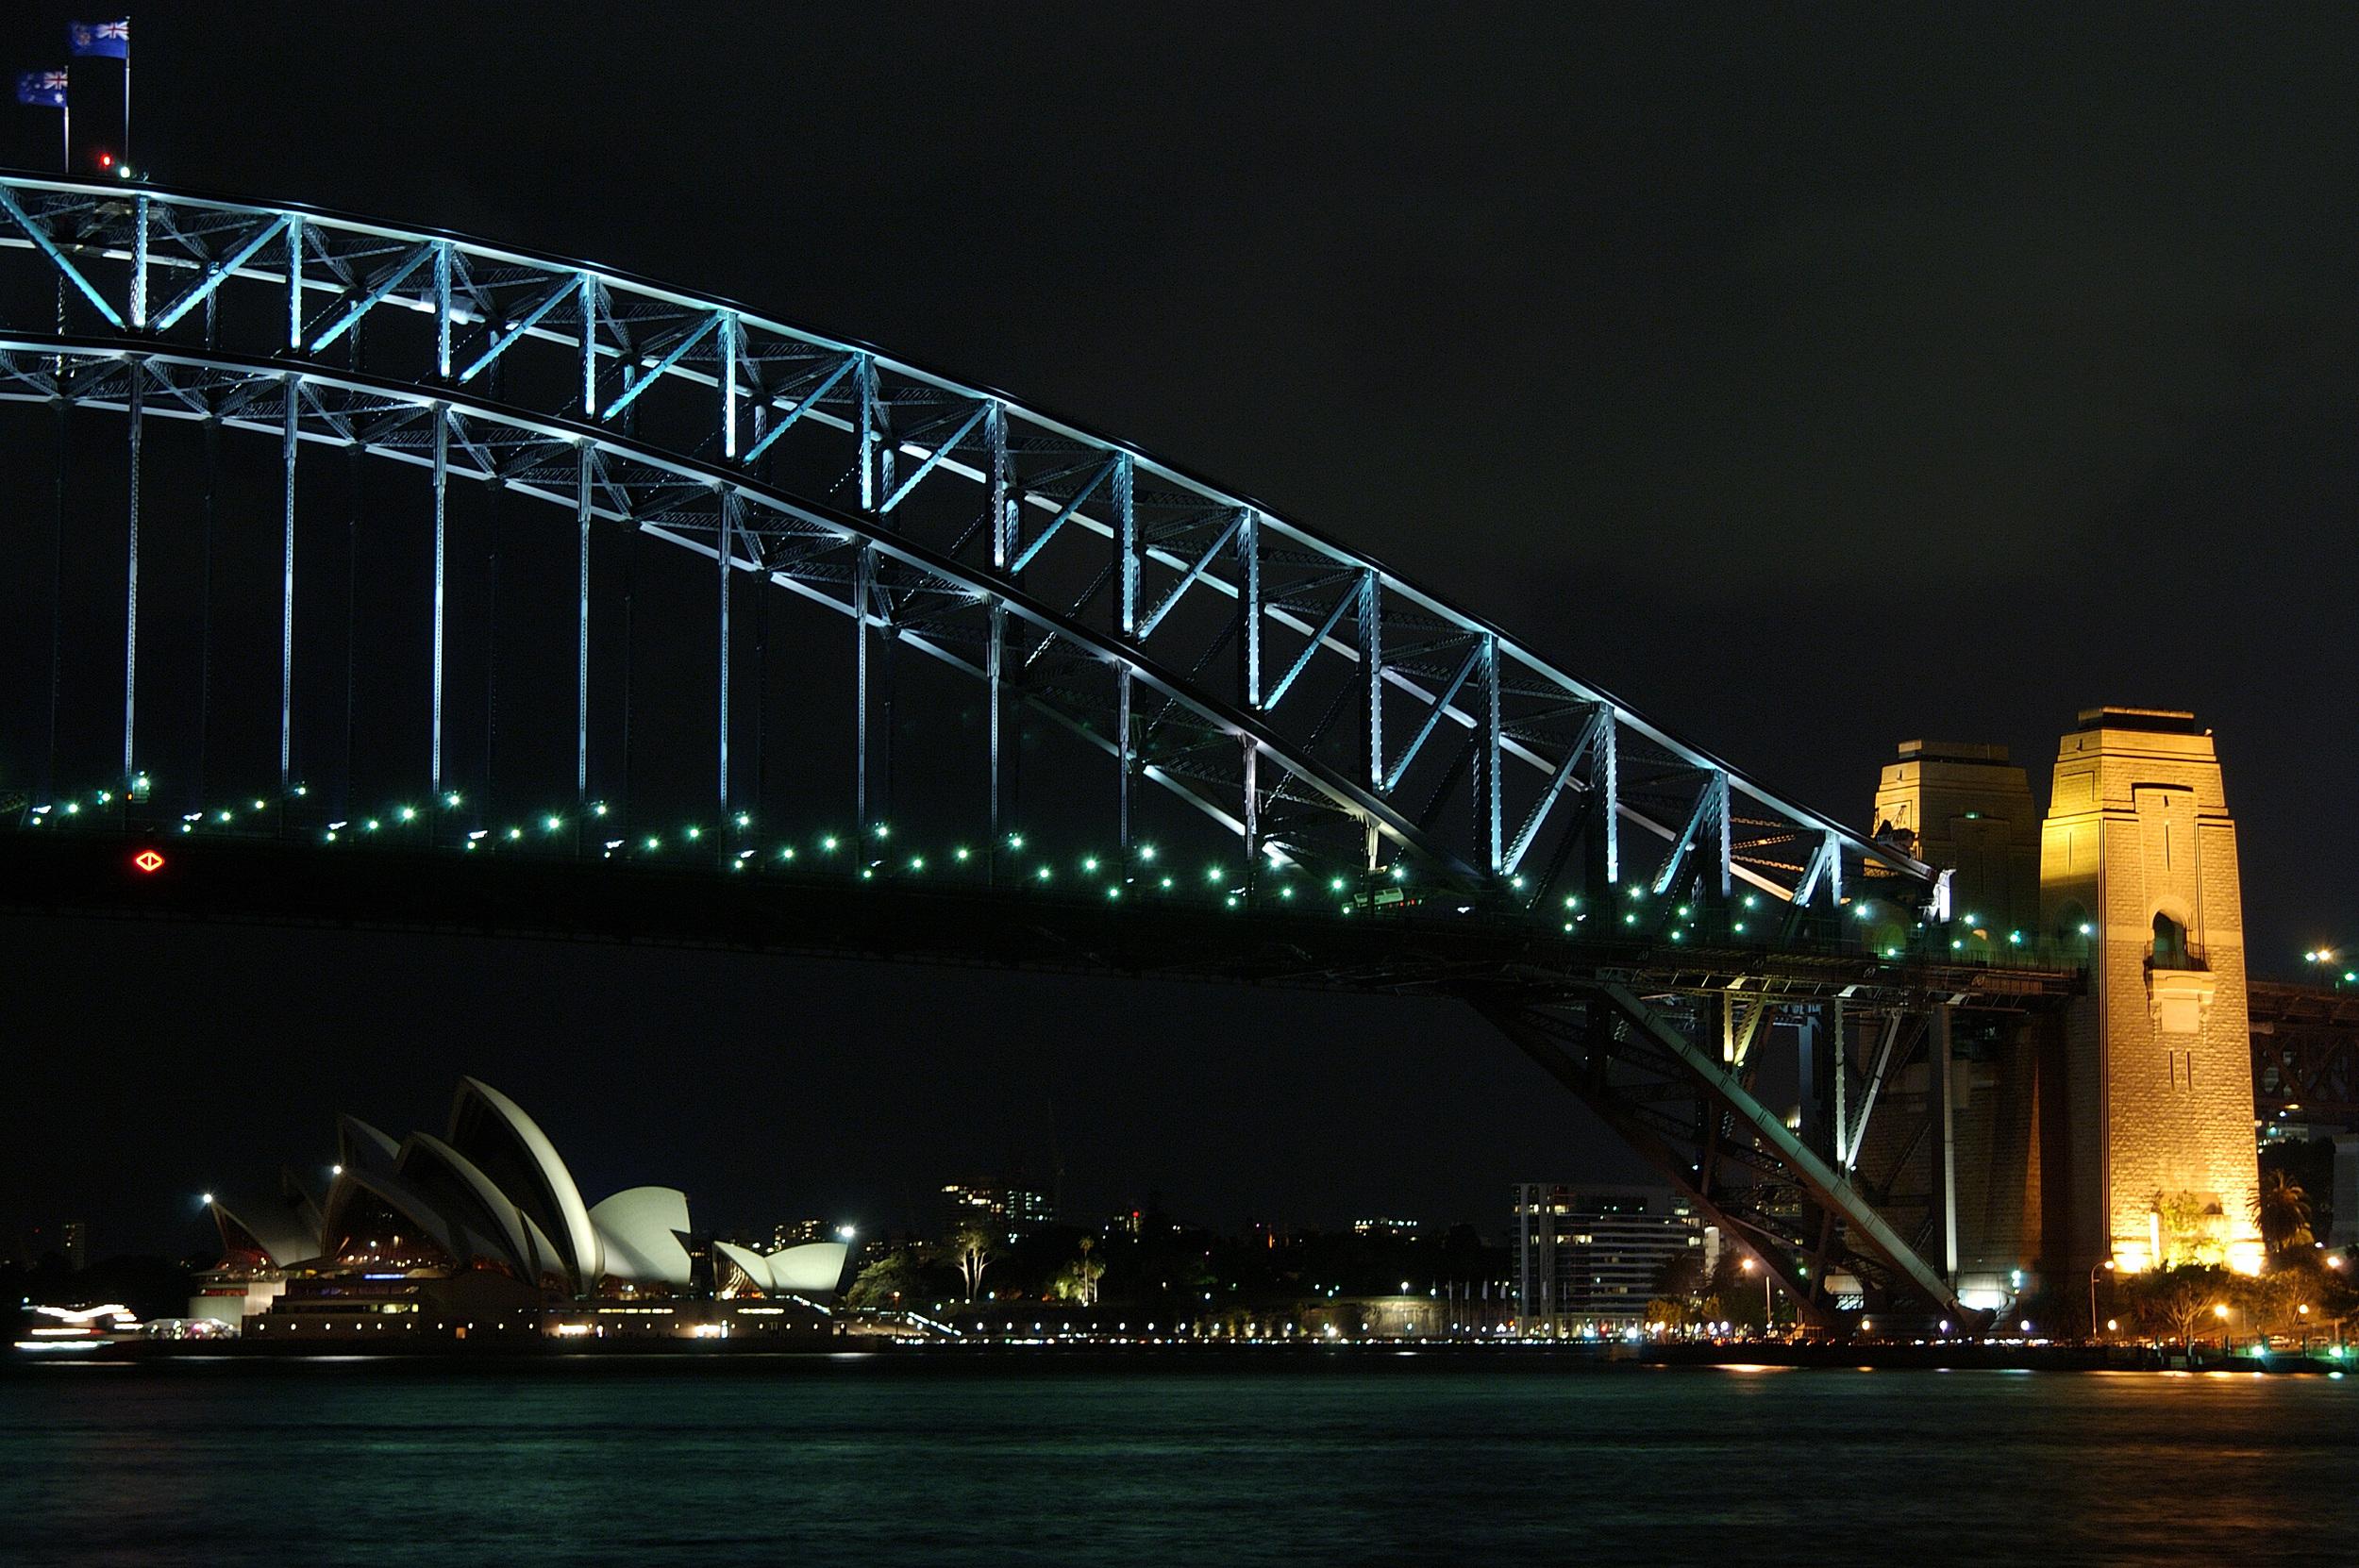 An iconic nighttime view of Sydney Harbor, Sydney Australia